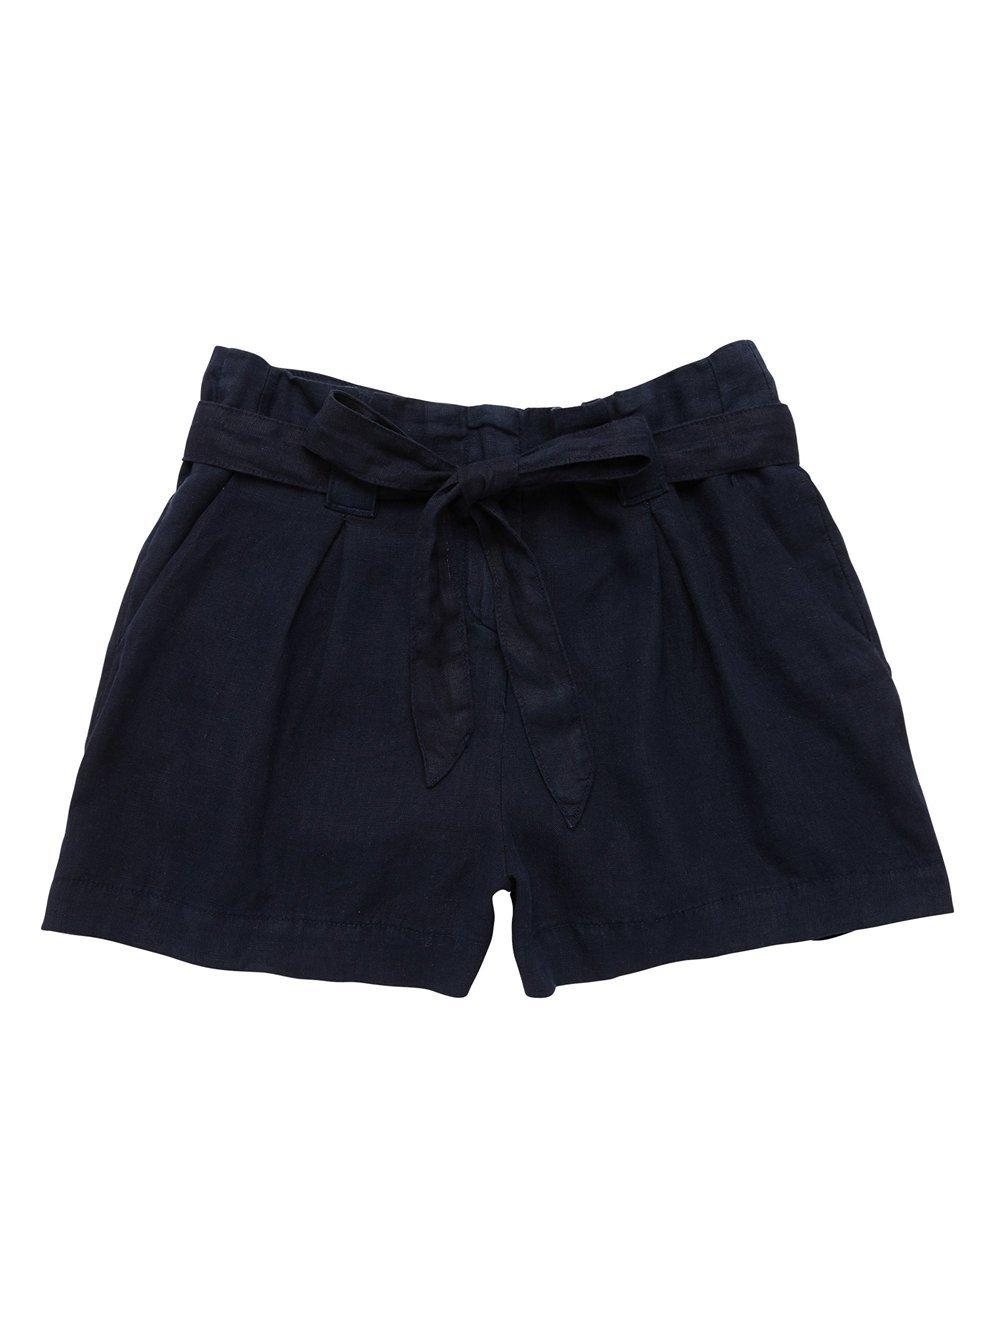 Hillary Paperbag Shorts Item # 2636FLI